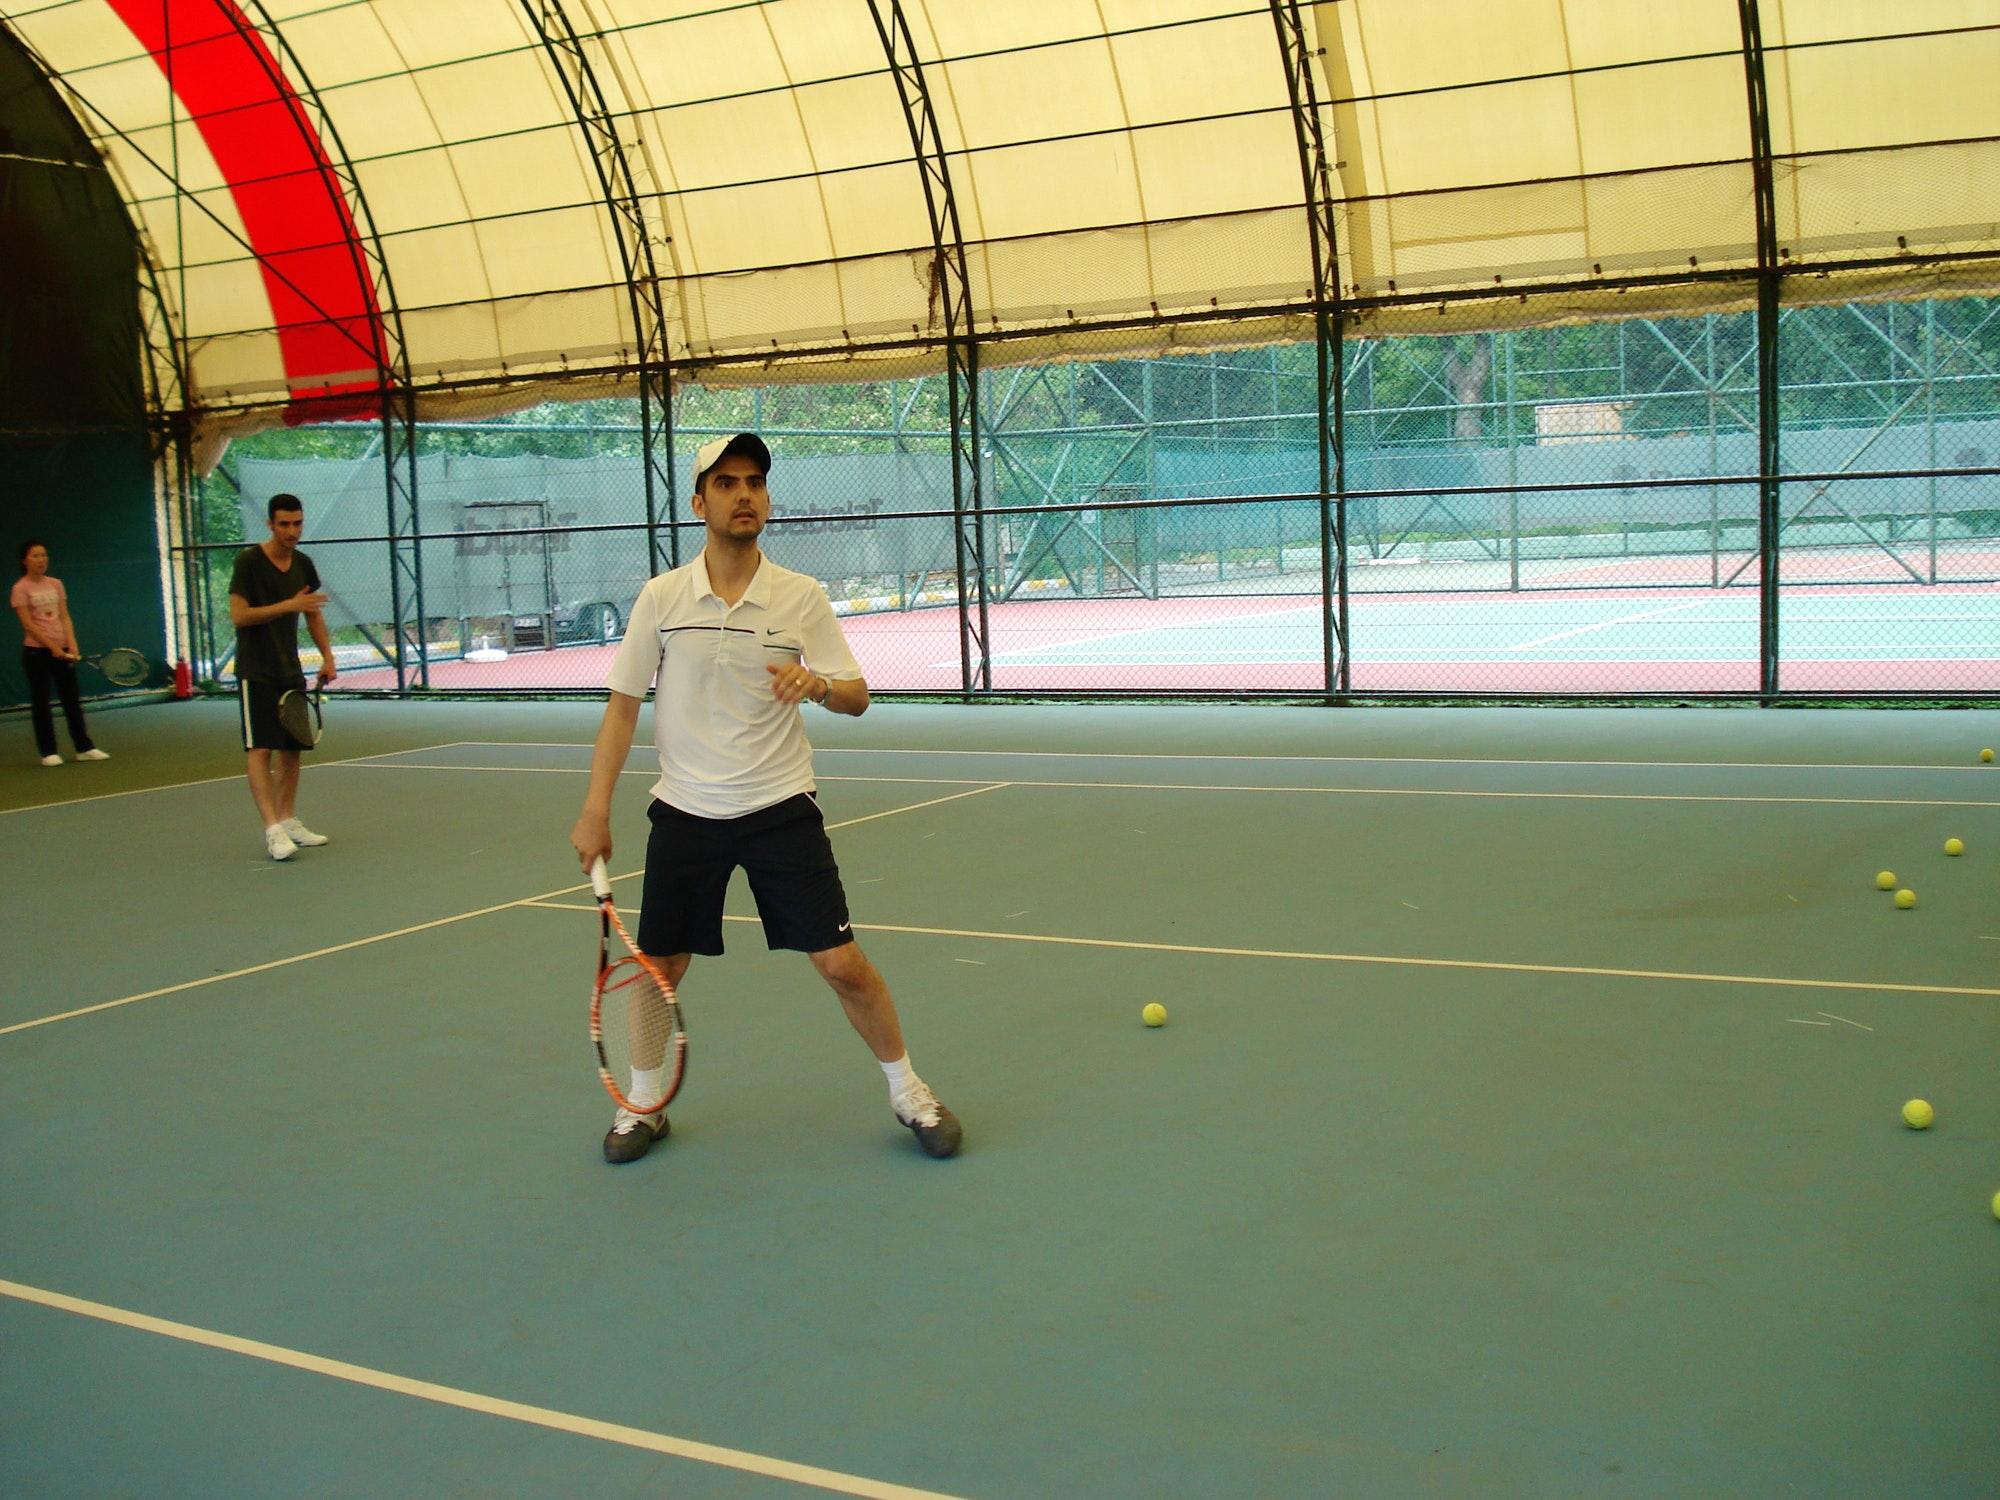 John A. teaches tennis lessons in Tysons Corner, VA